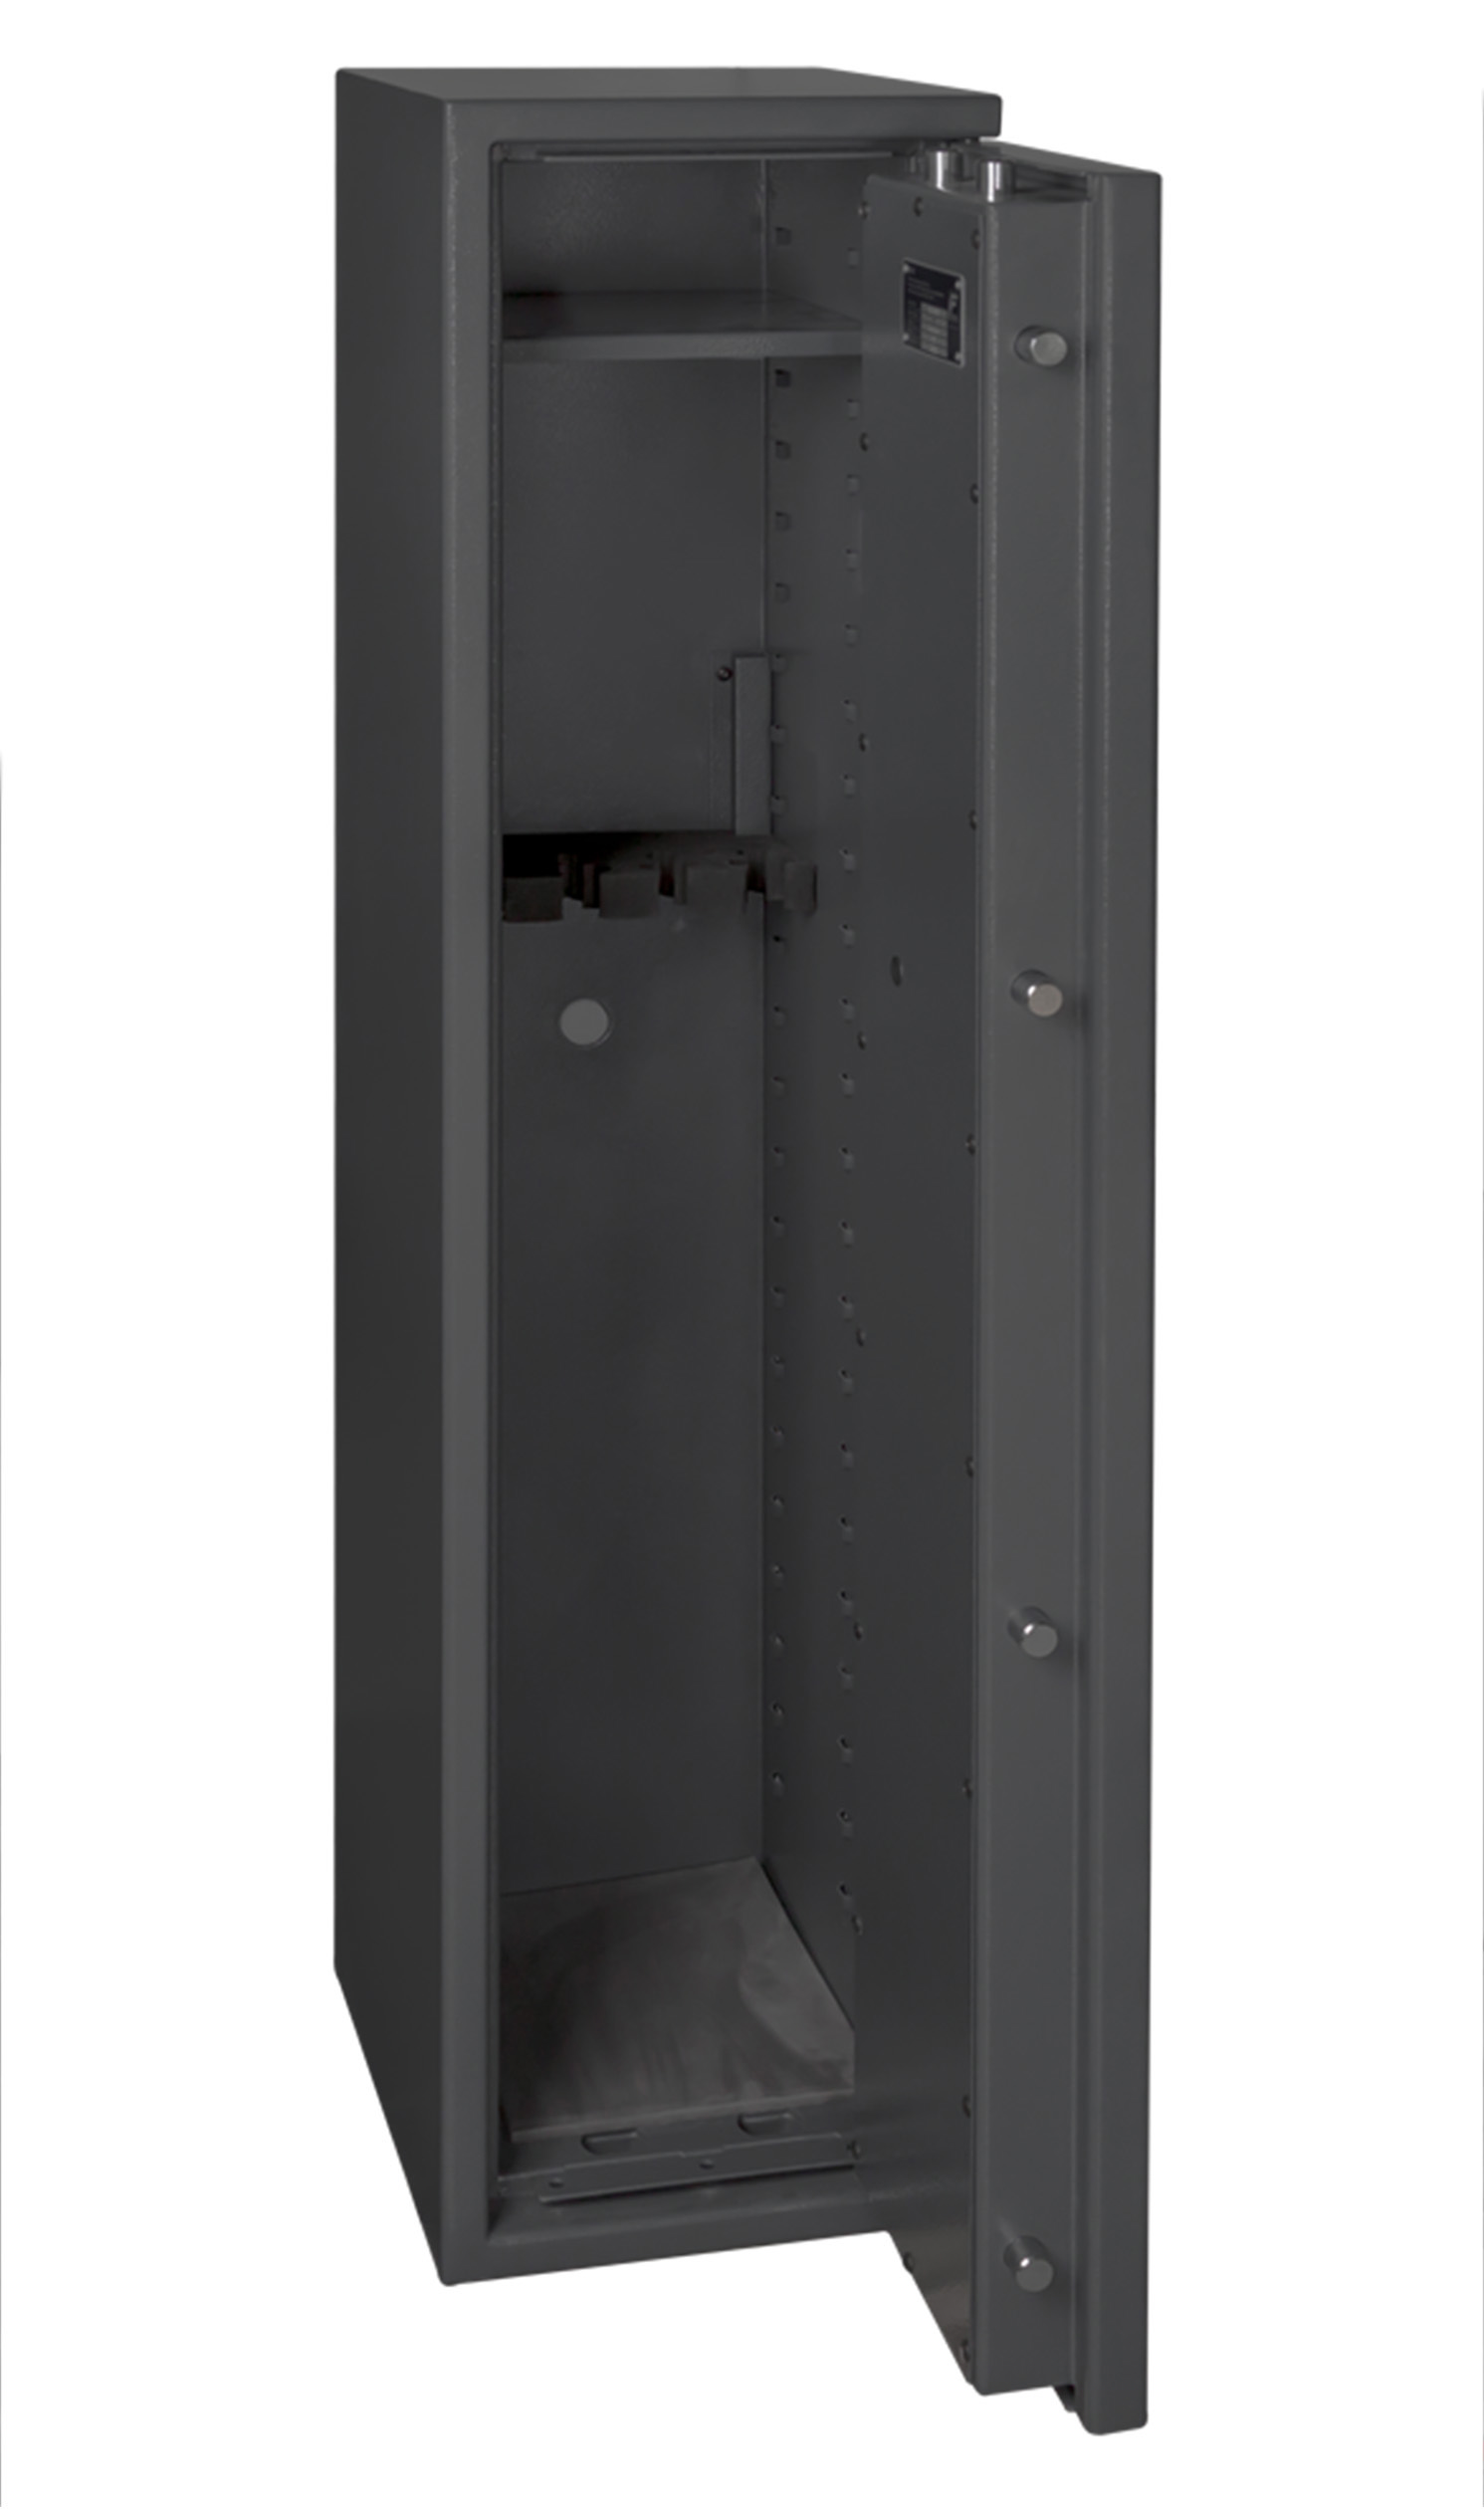 waffenschrank gun safe 0 4 mit zahlenschloss en 1143 1. Black Bedroom Furniture Sets. Home Design Ideas